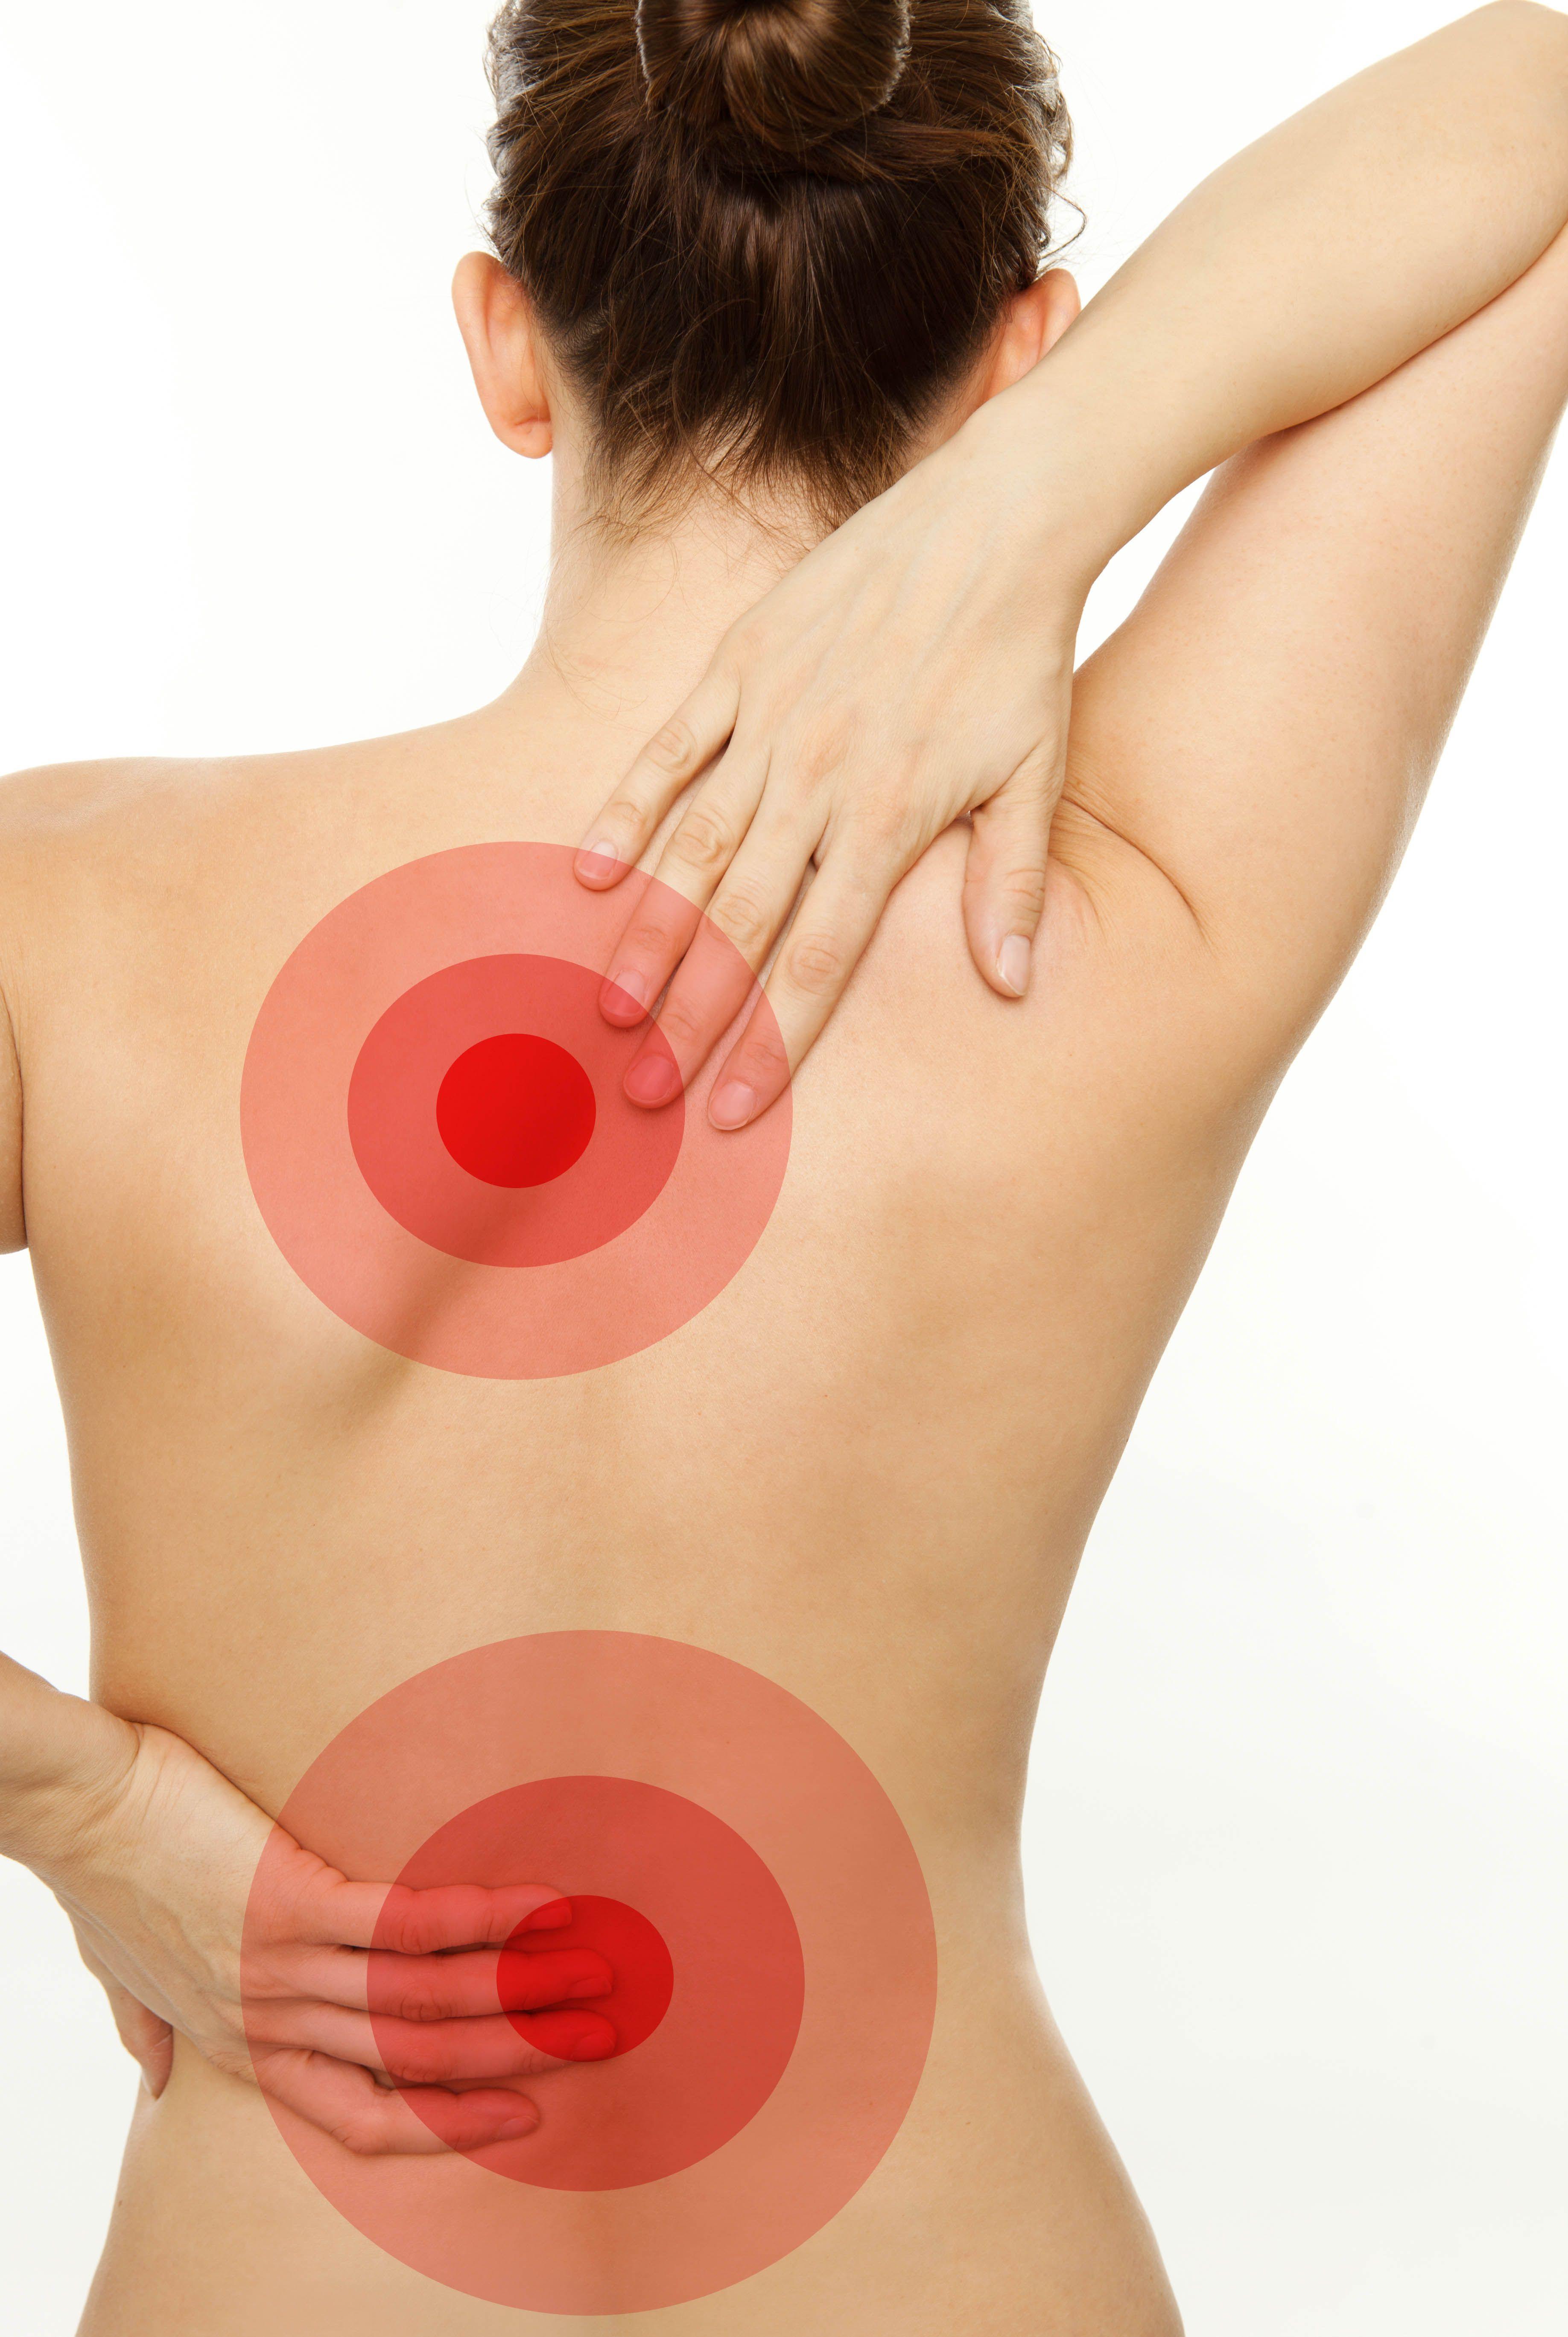 bóle pleców